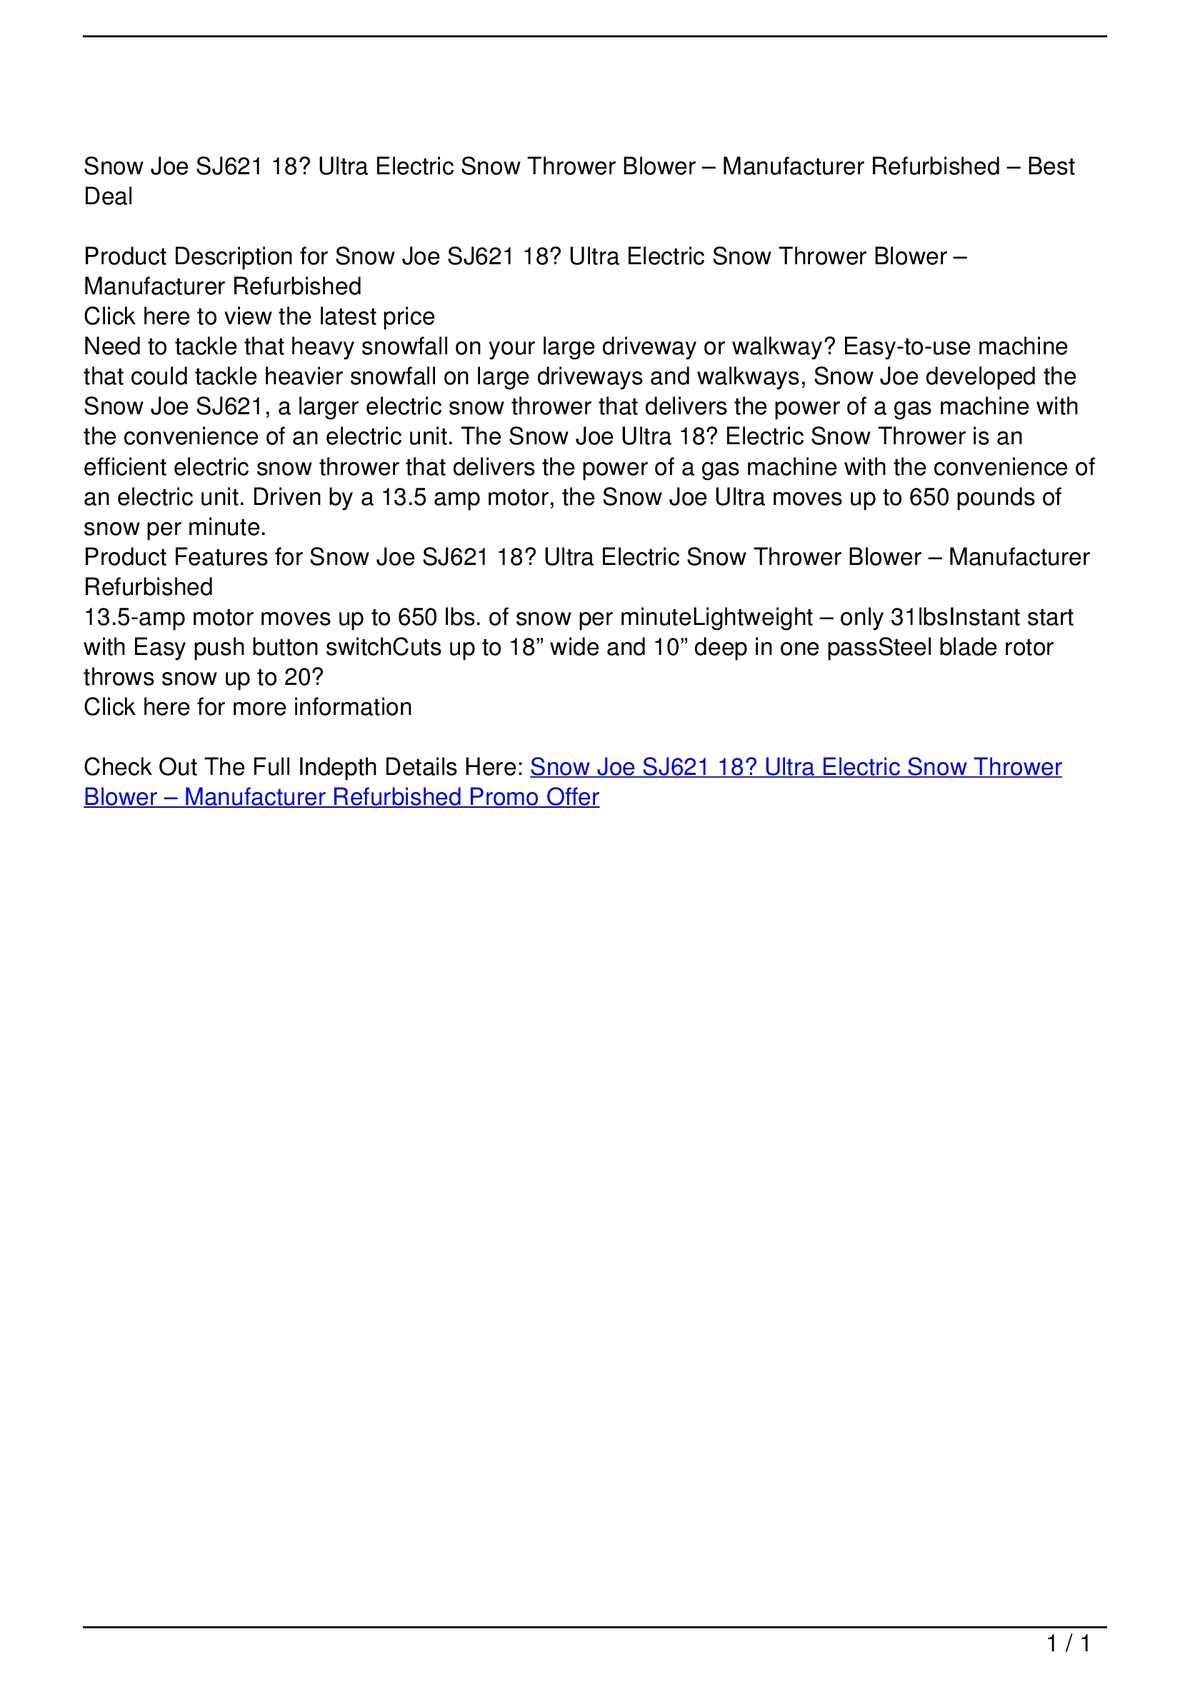 Calameo Snow Joe Sj621 18 Ultra Electric Snow Thrower Blower Manufacturer Refurbished Promo Offer